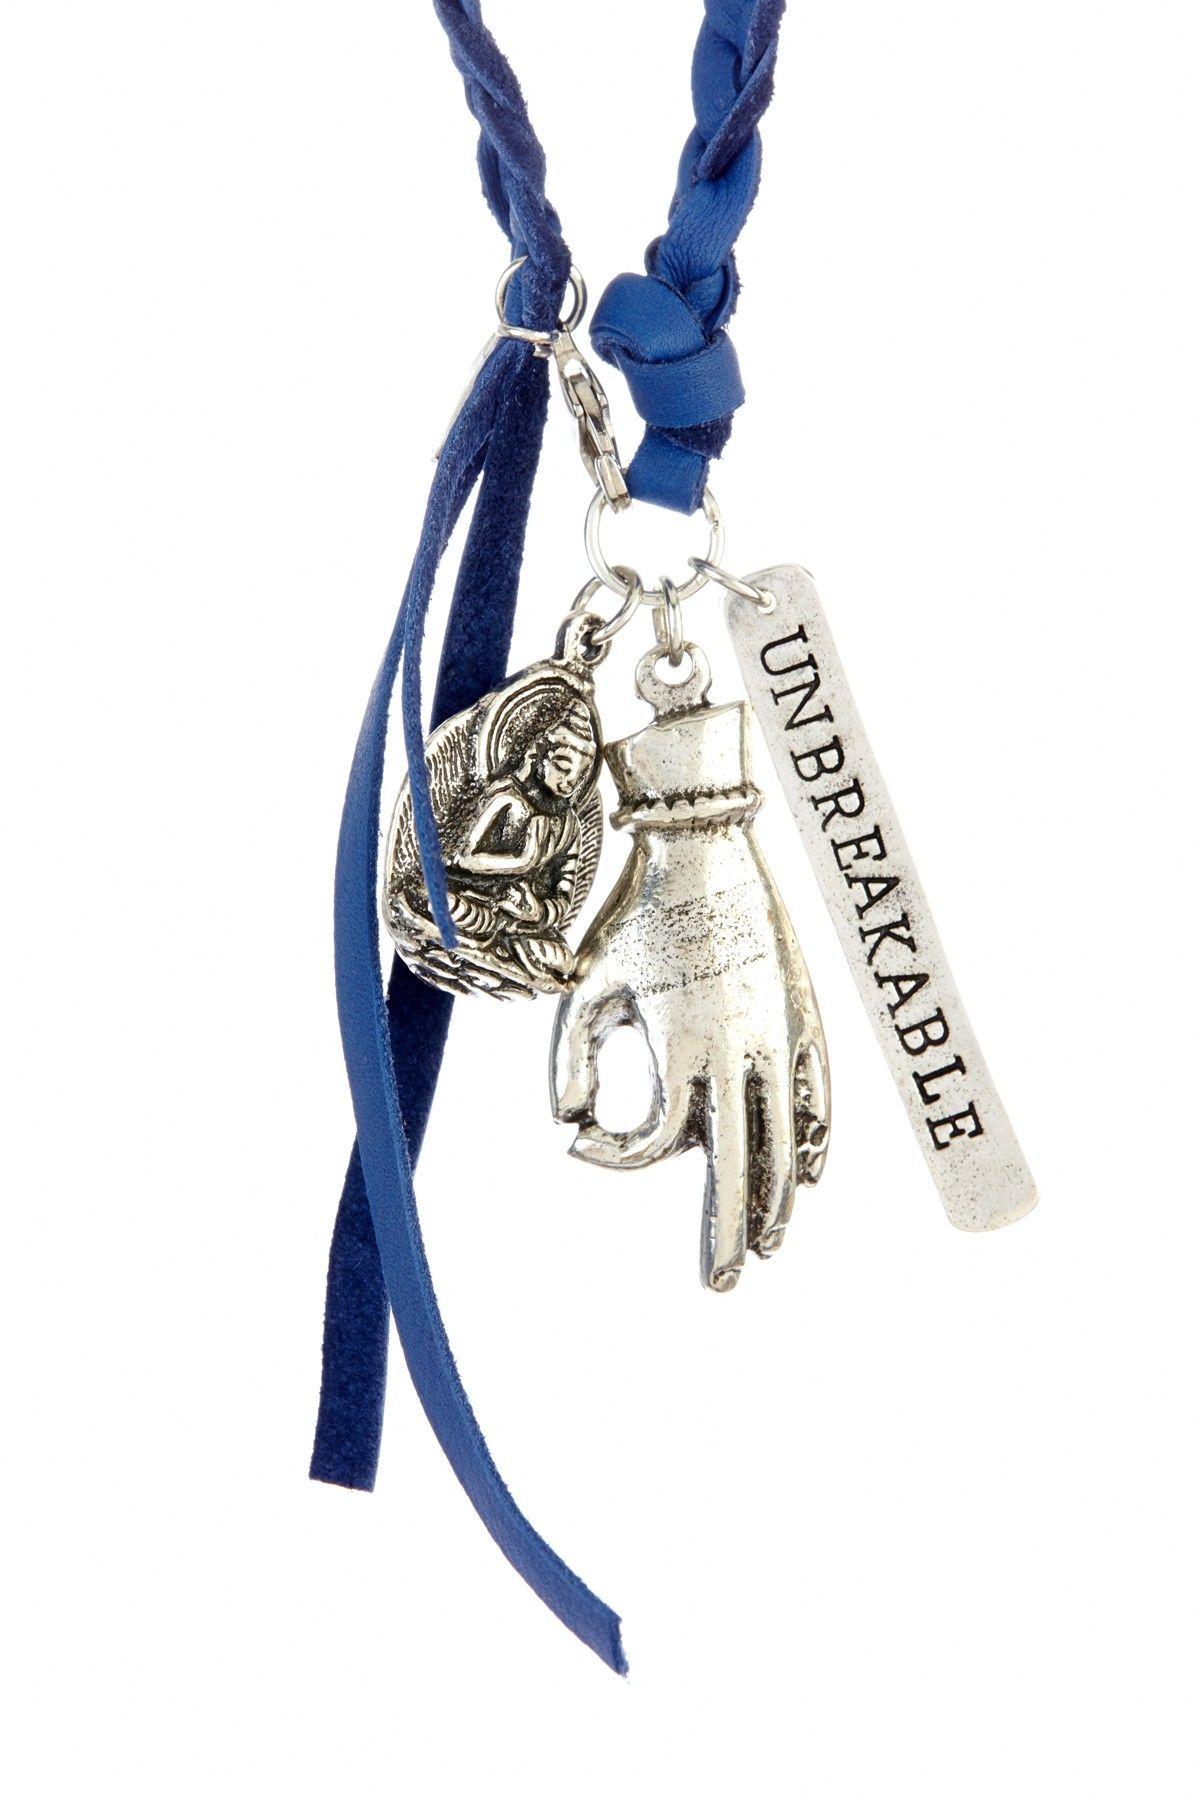 Alisa Michelle Unbreakable Leather Necklace - Silver on HauteLook